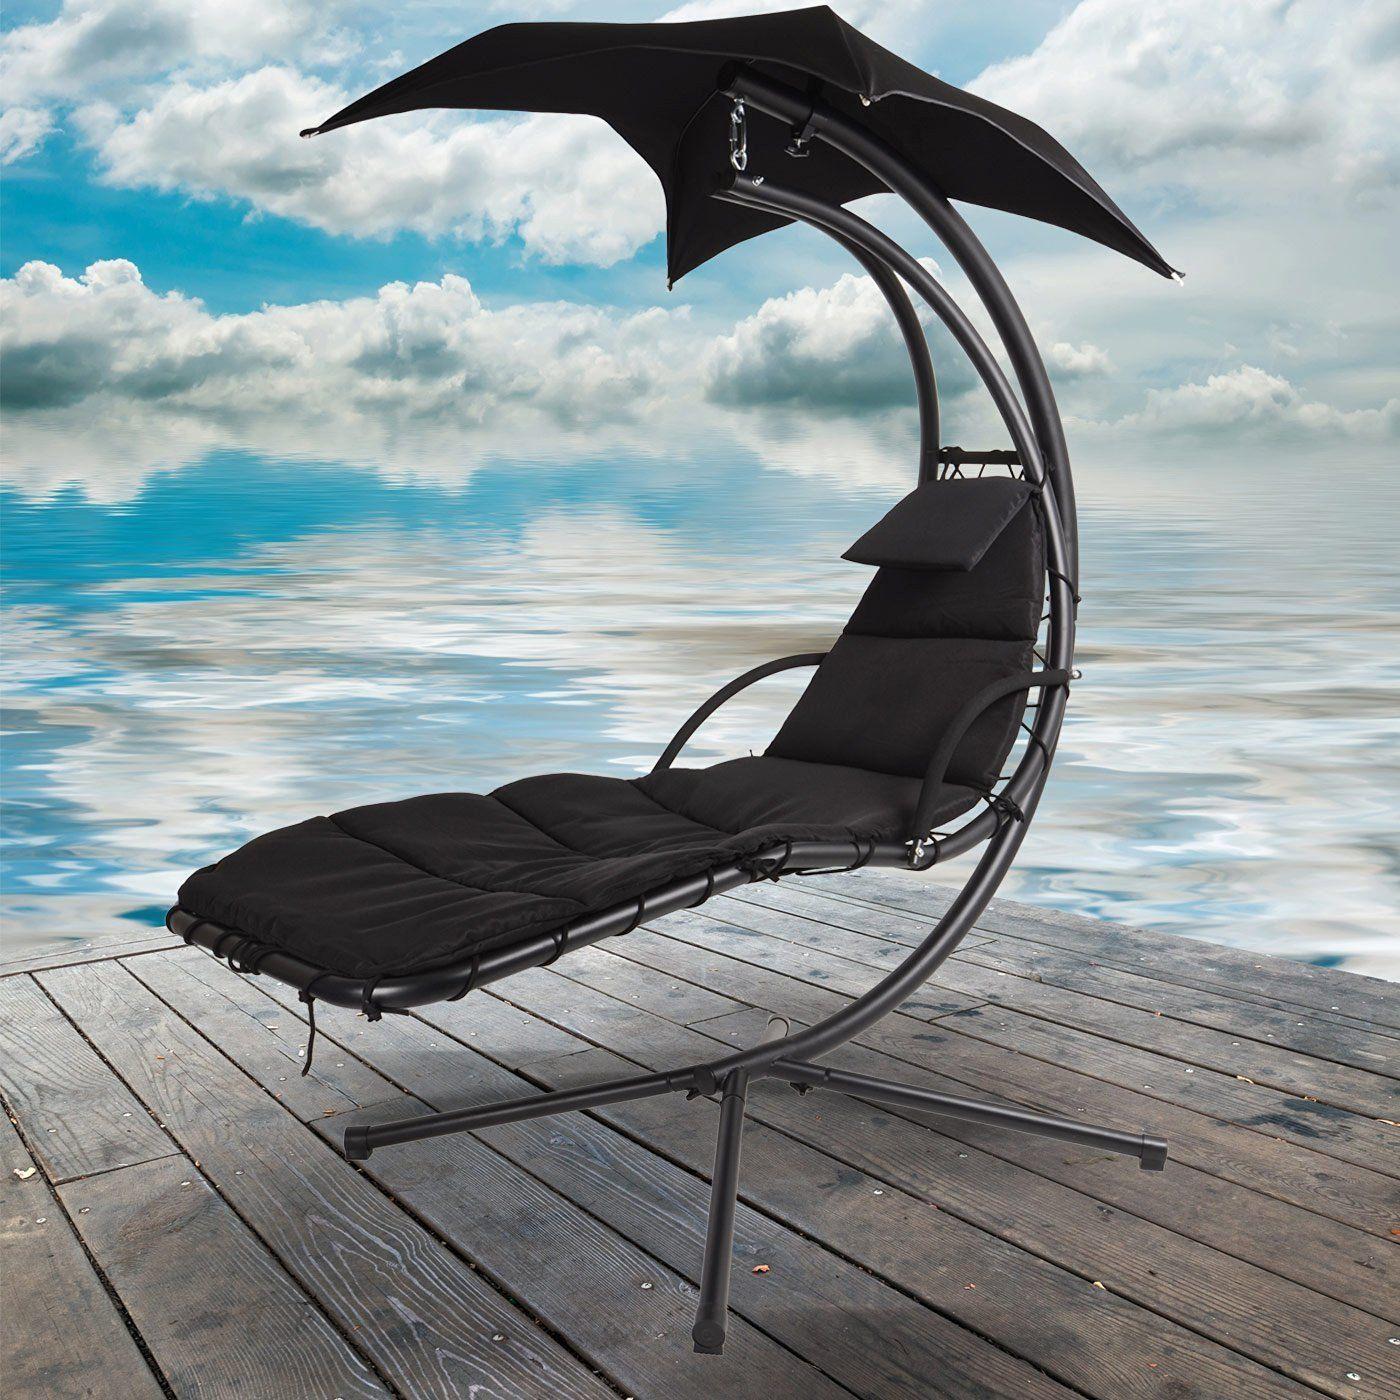 outdoor dream chair ergonomic guitarists black garden hammock canopy swing sun lounger